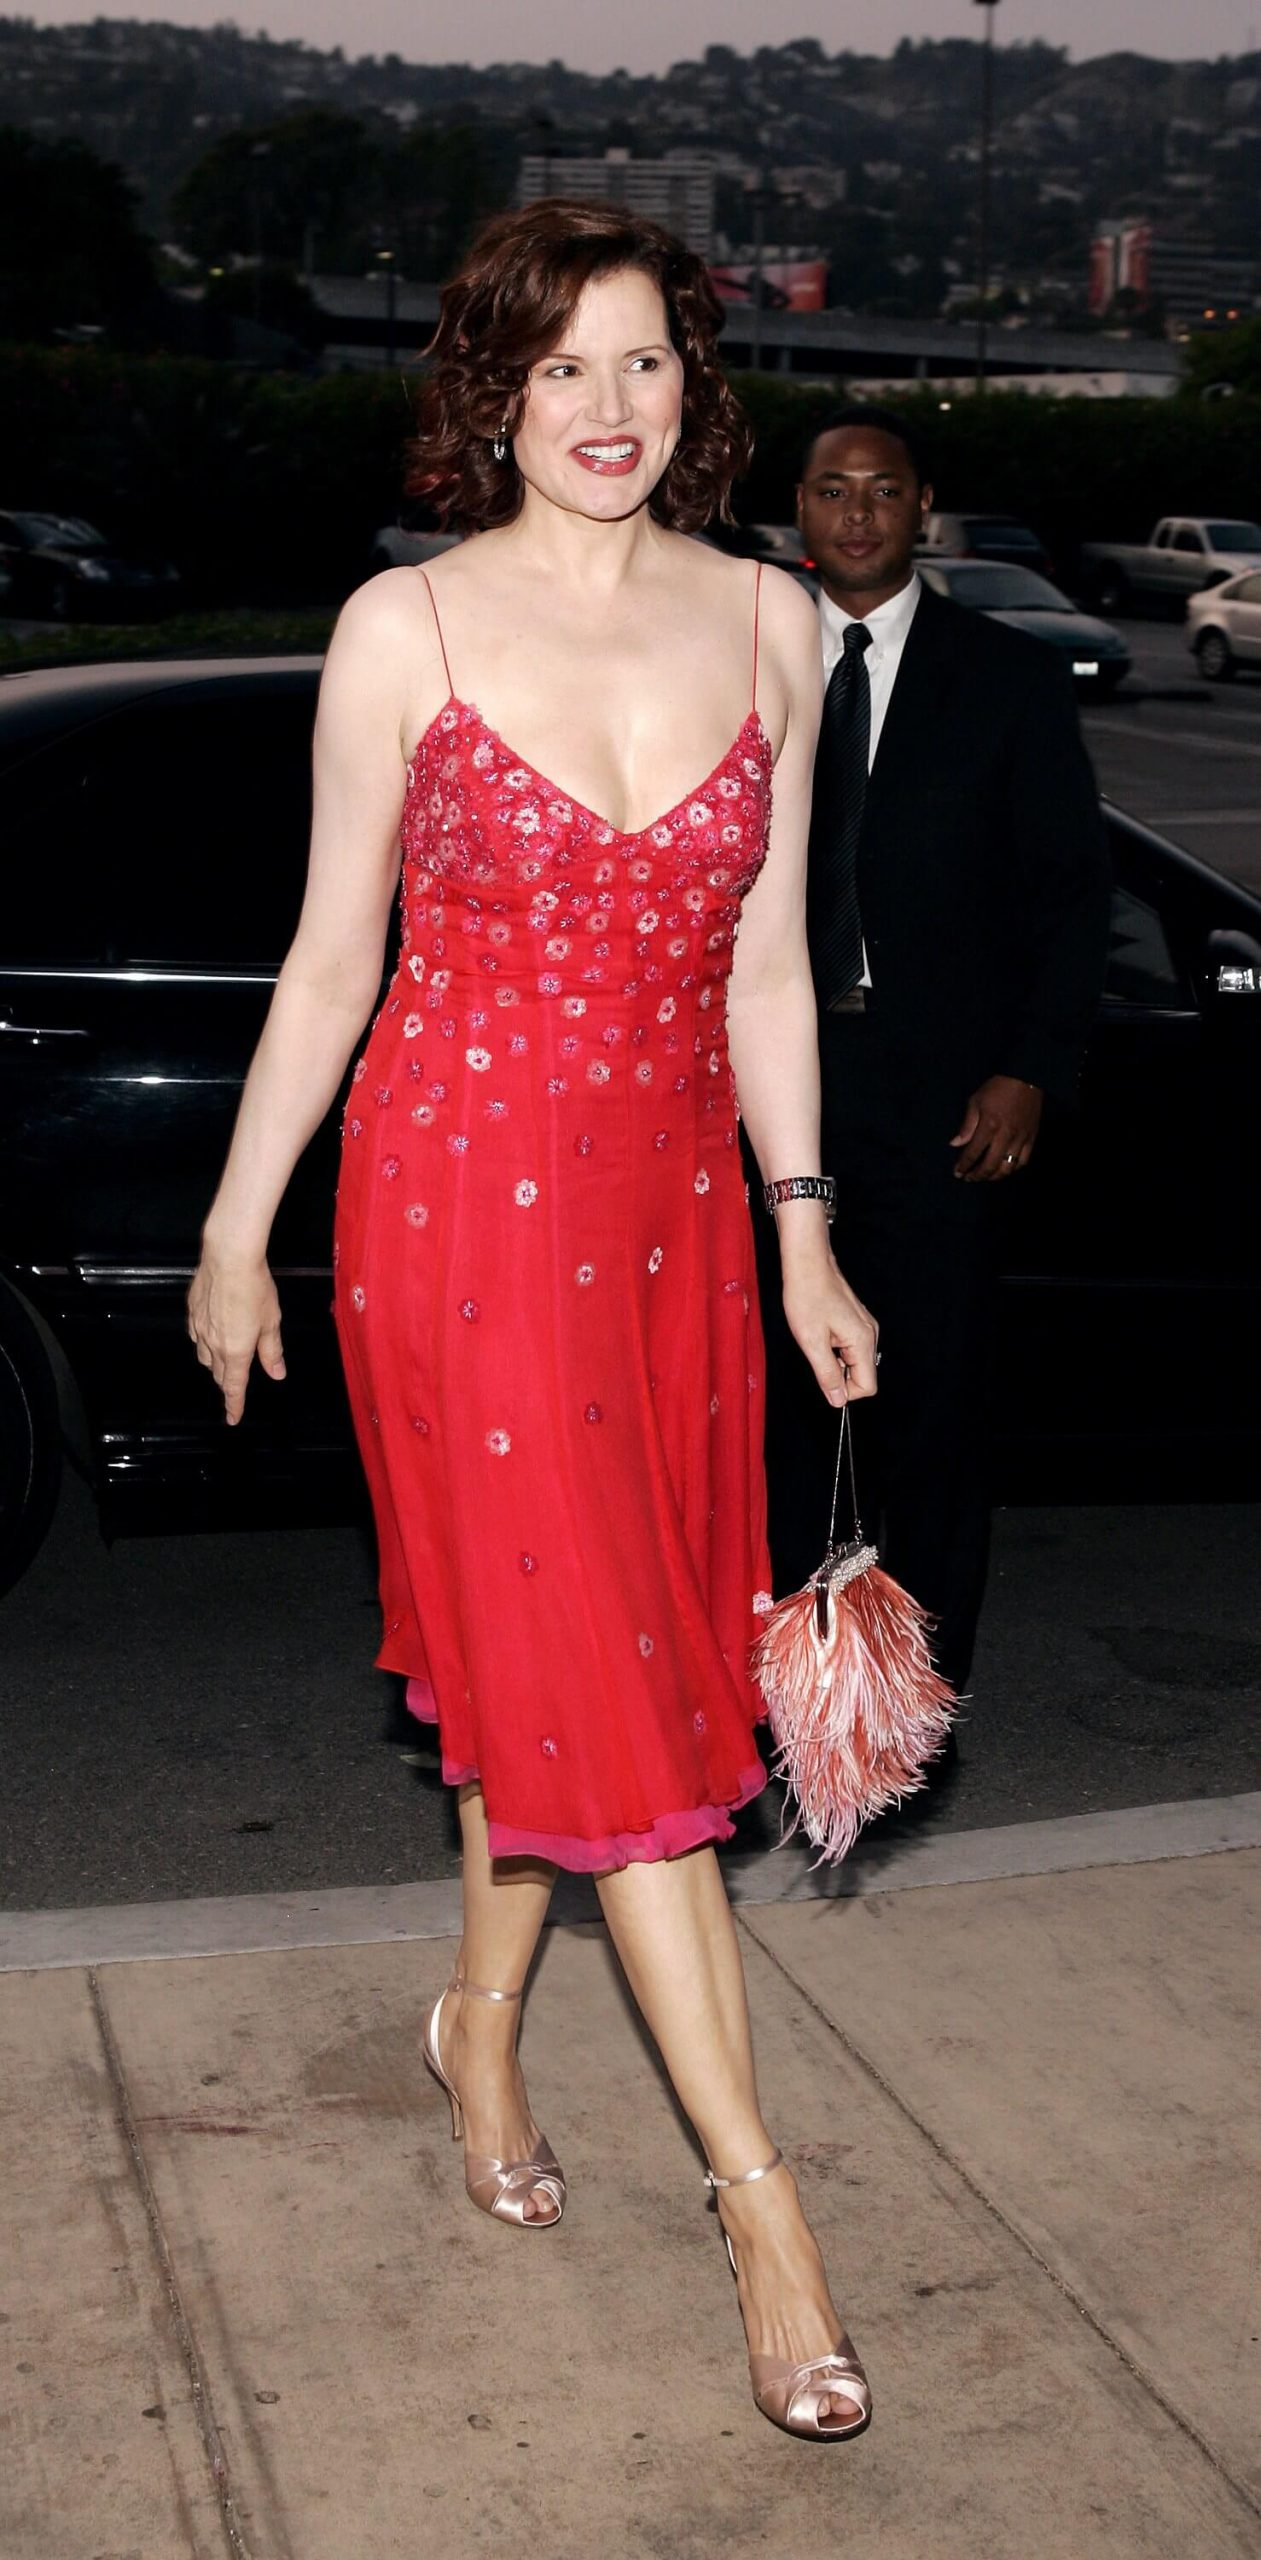 Geena Davis hot look pics